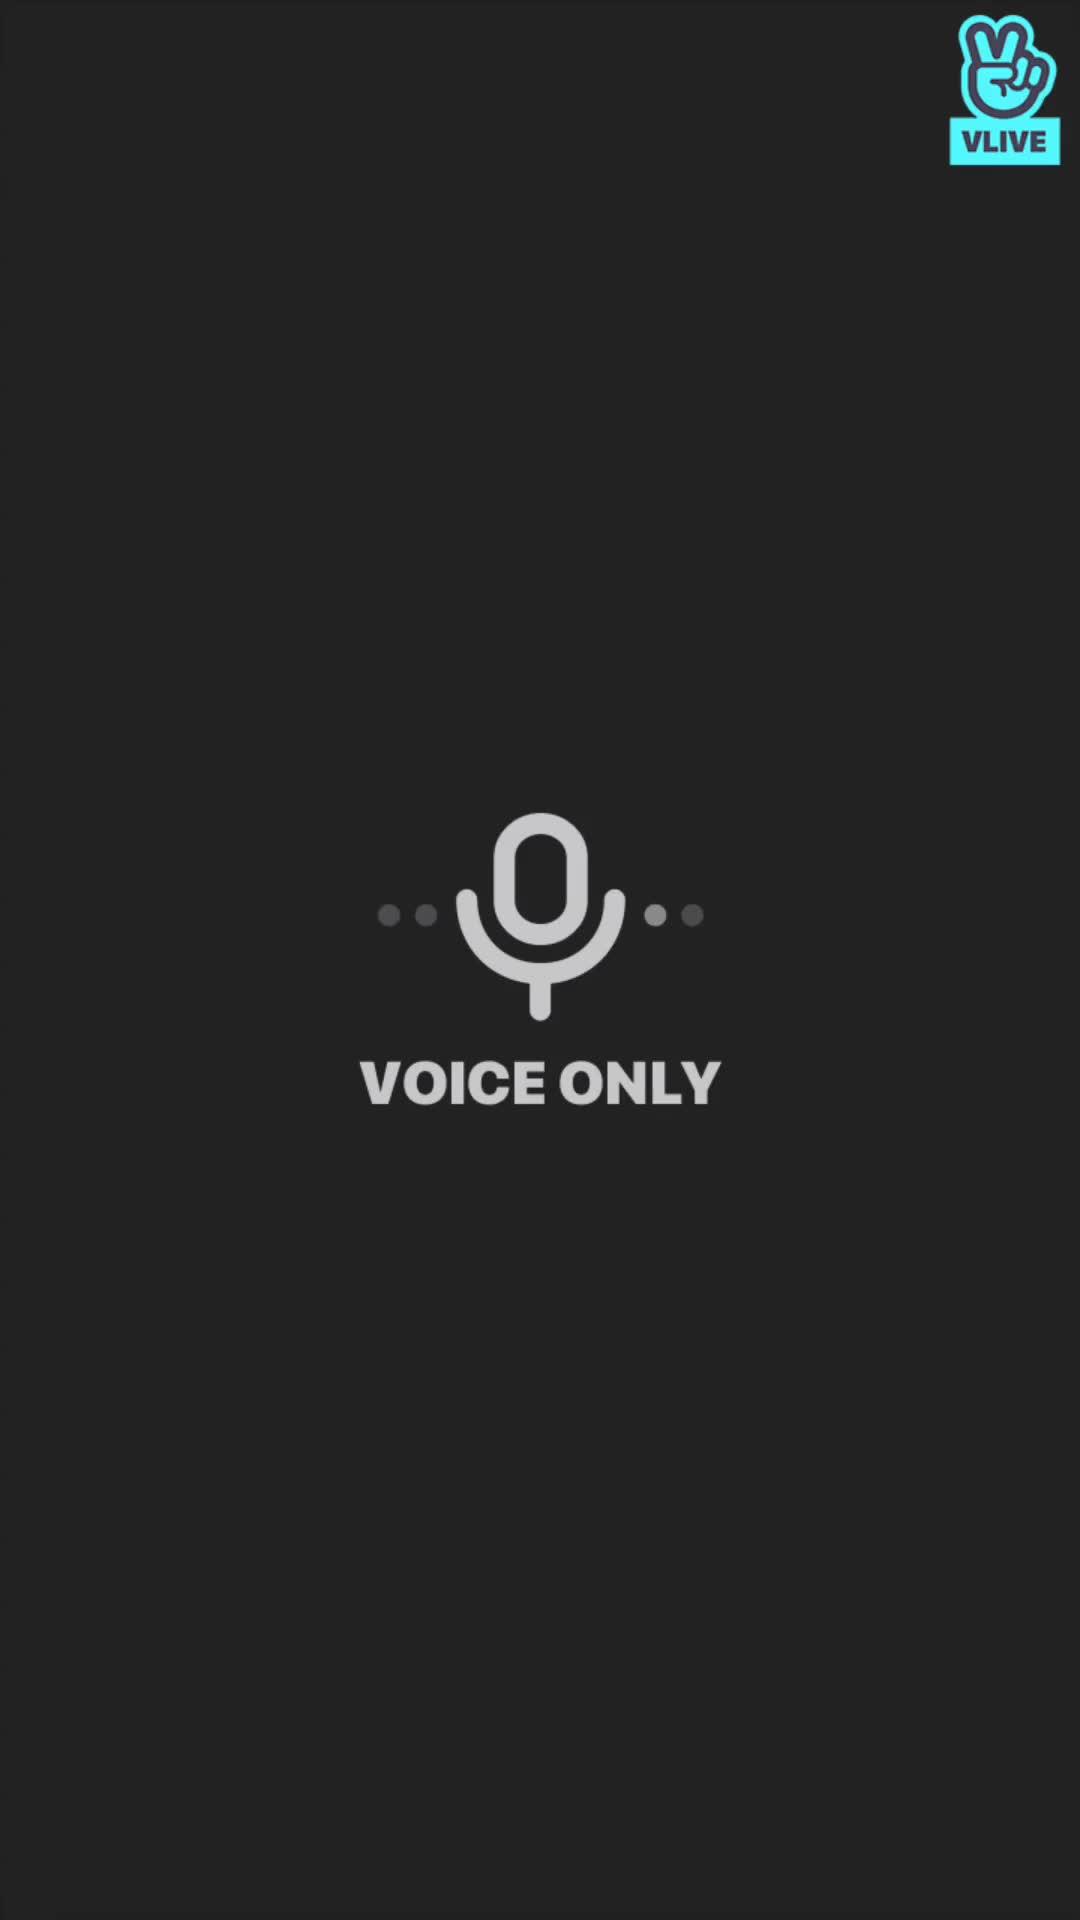 [RADIO] 캐럿들 귀대귀대 #82